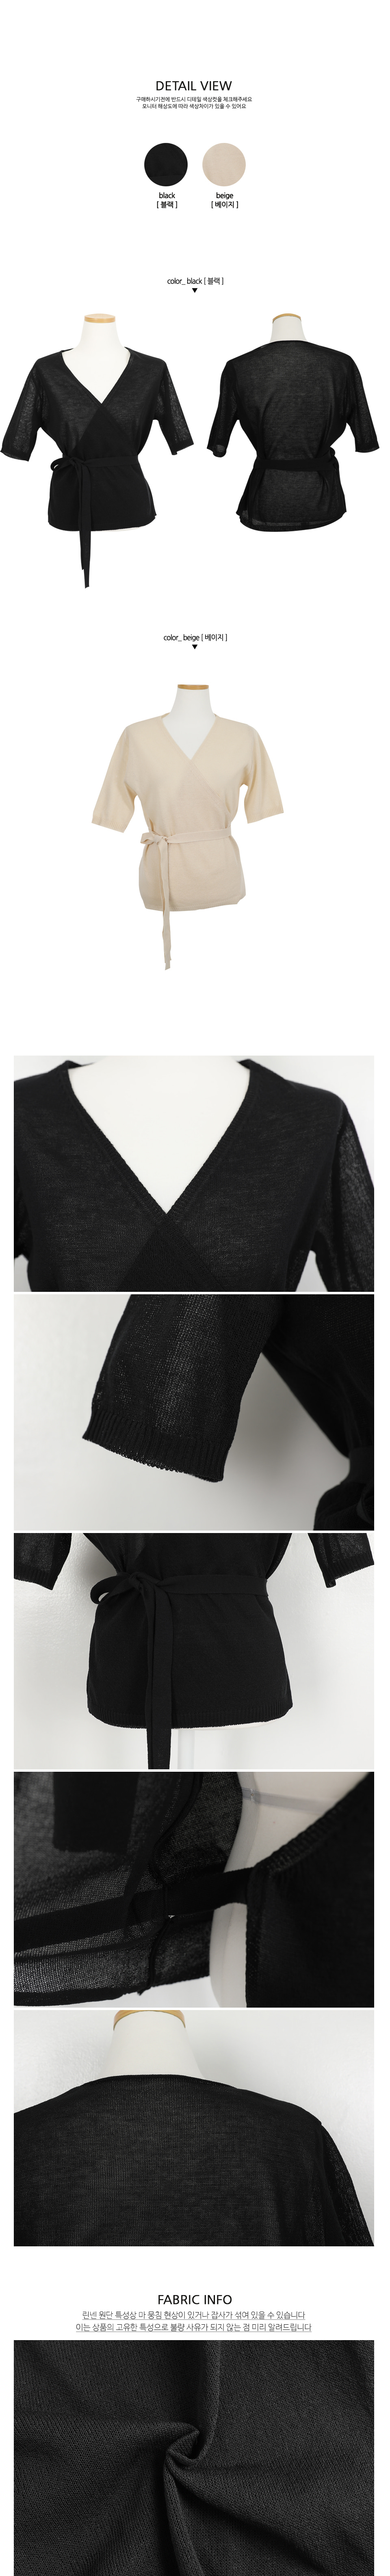 Flingnap Knit Cardigan